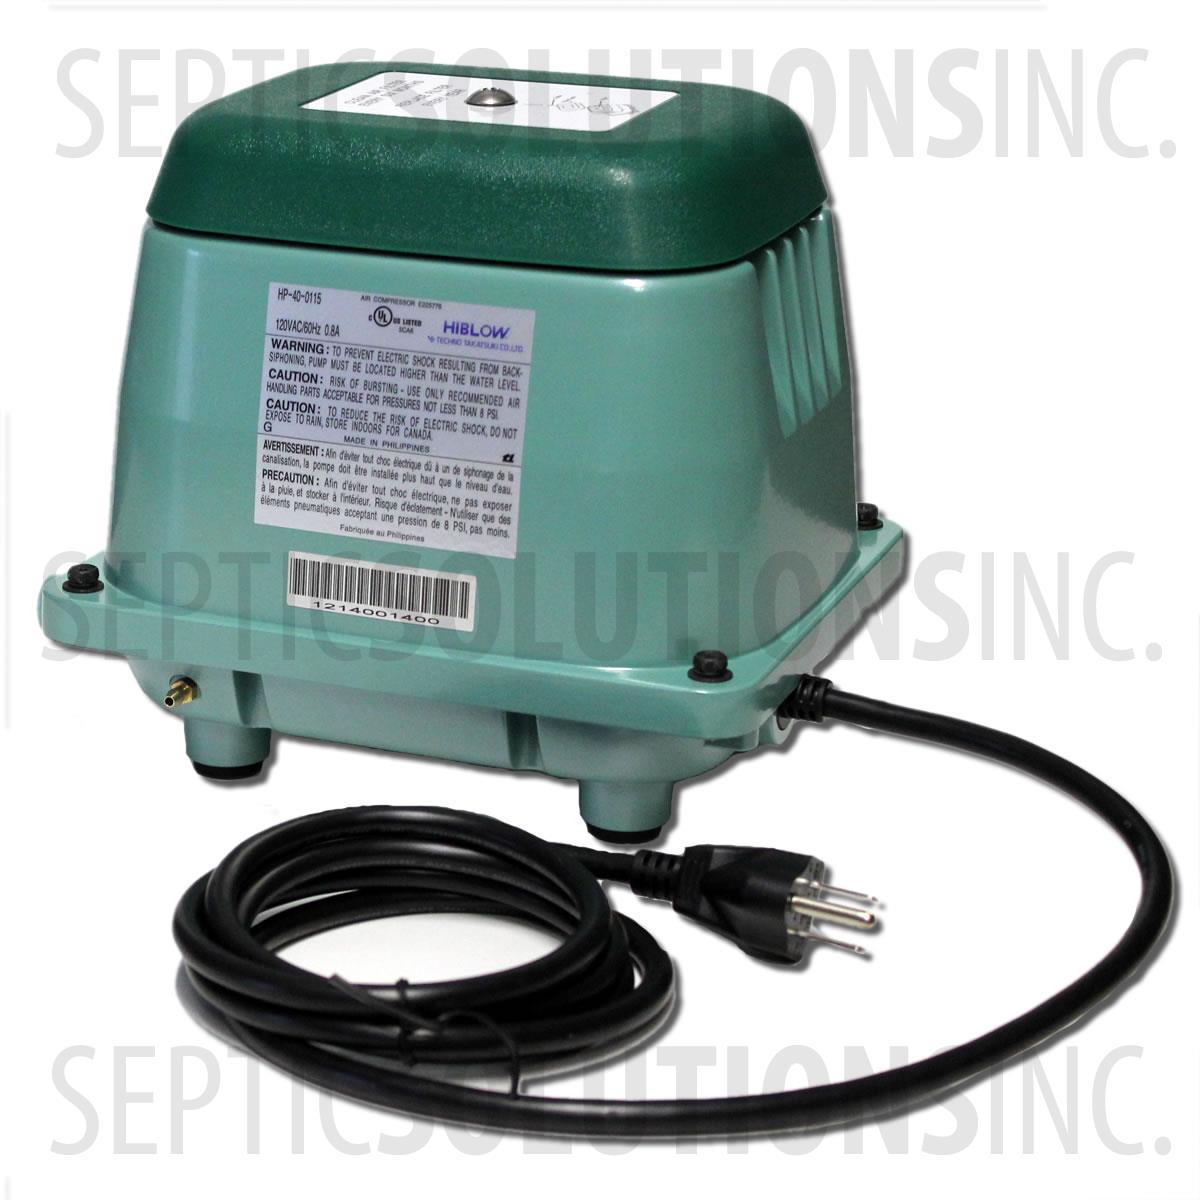 Hiblow Hp 40 Linear Septic Air Pump Fast Amp Free Shipping